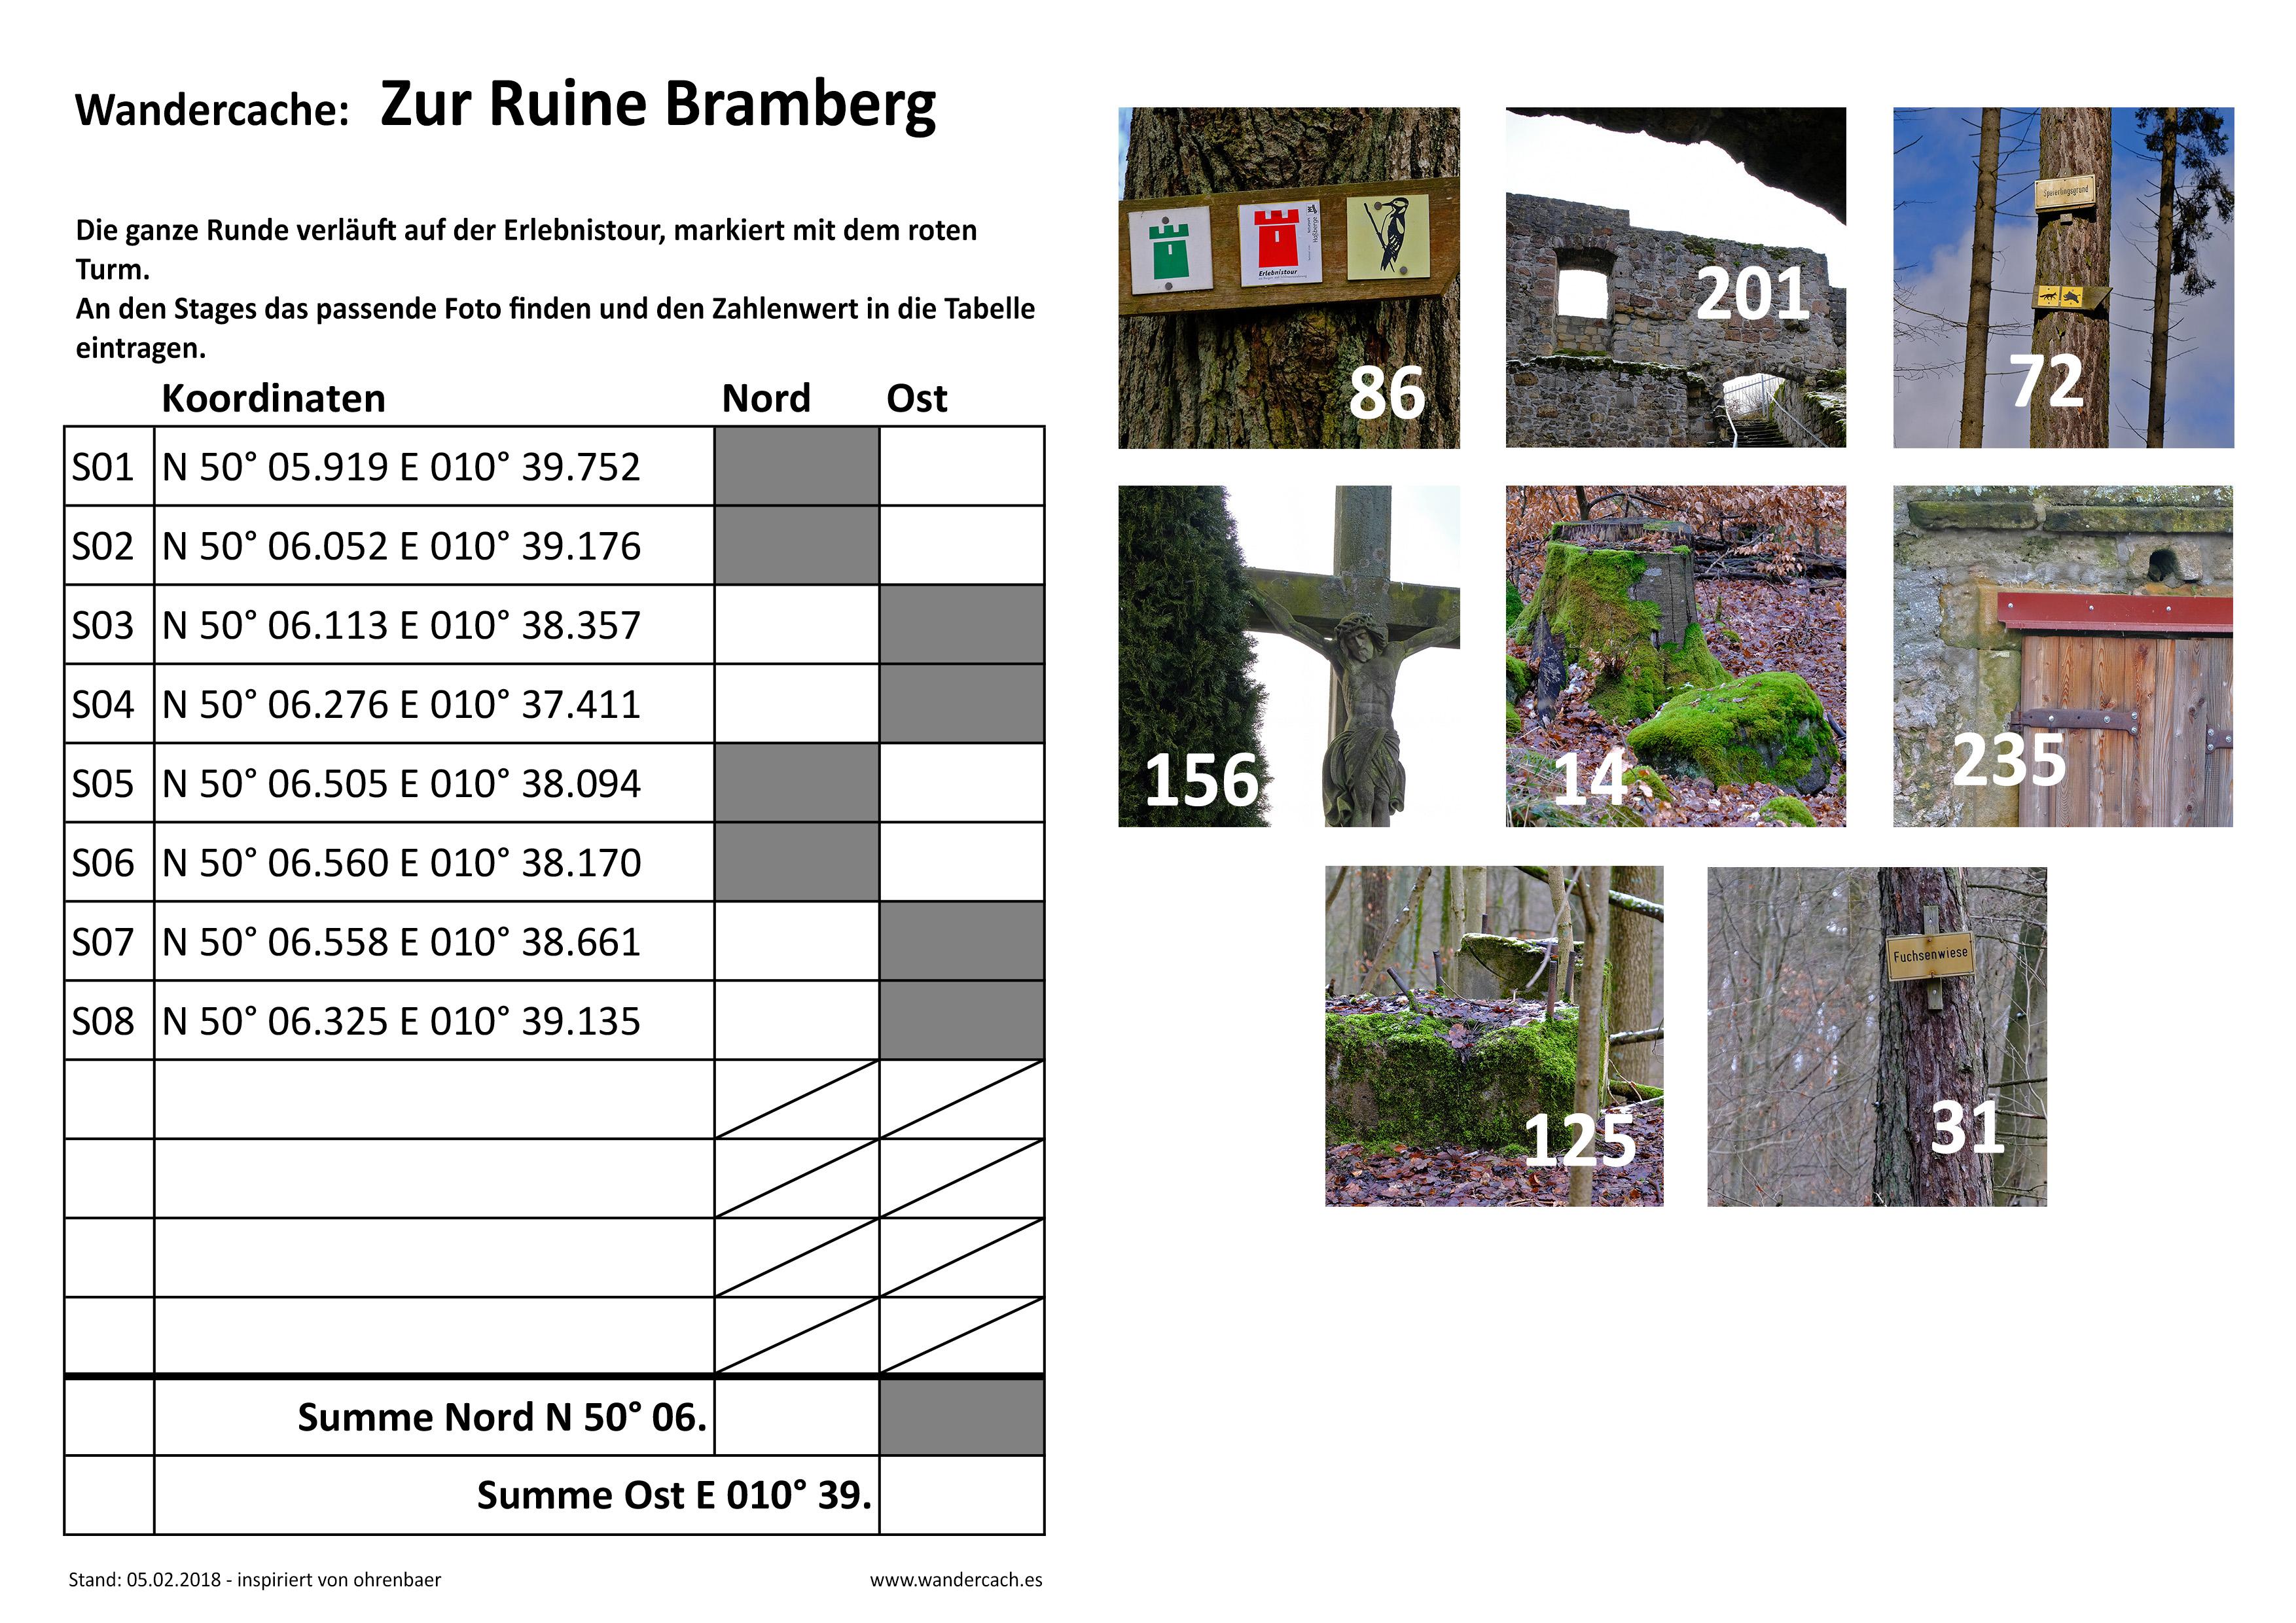 GC7HX0T Wandercache: Zur Ruine Bramberg (Multi-cache) in Bayern ...